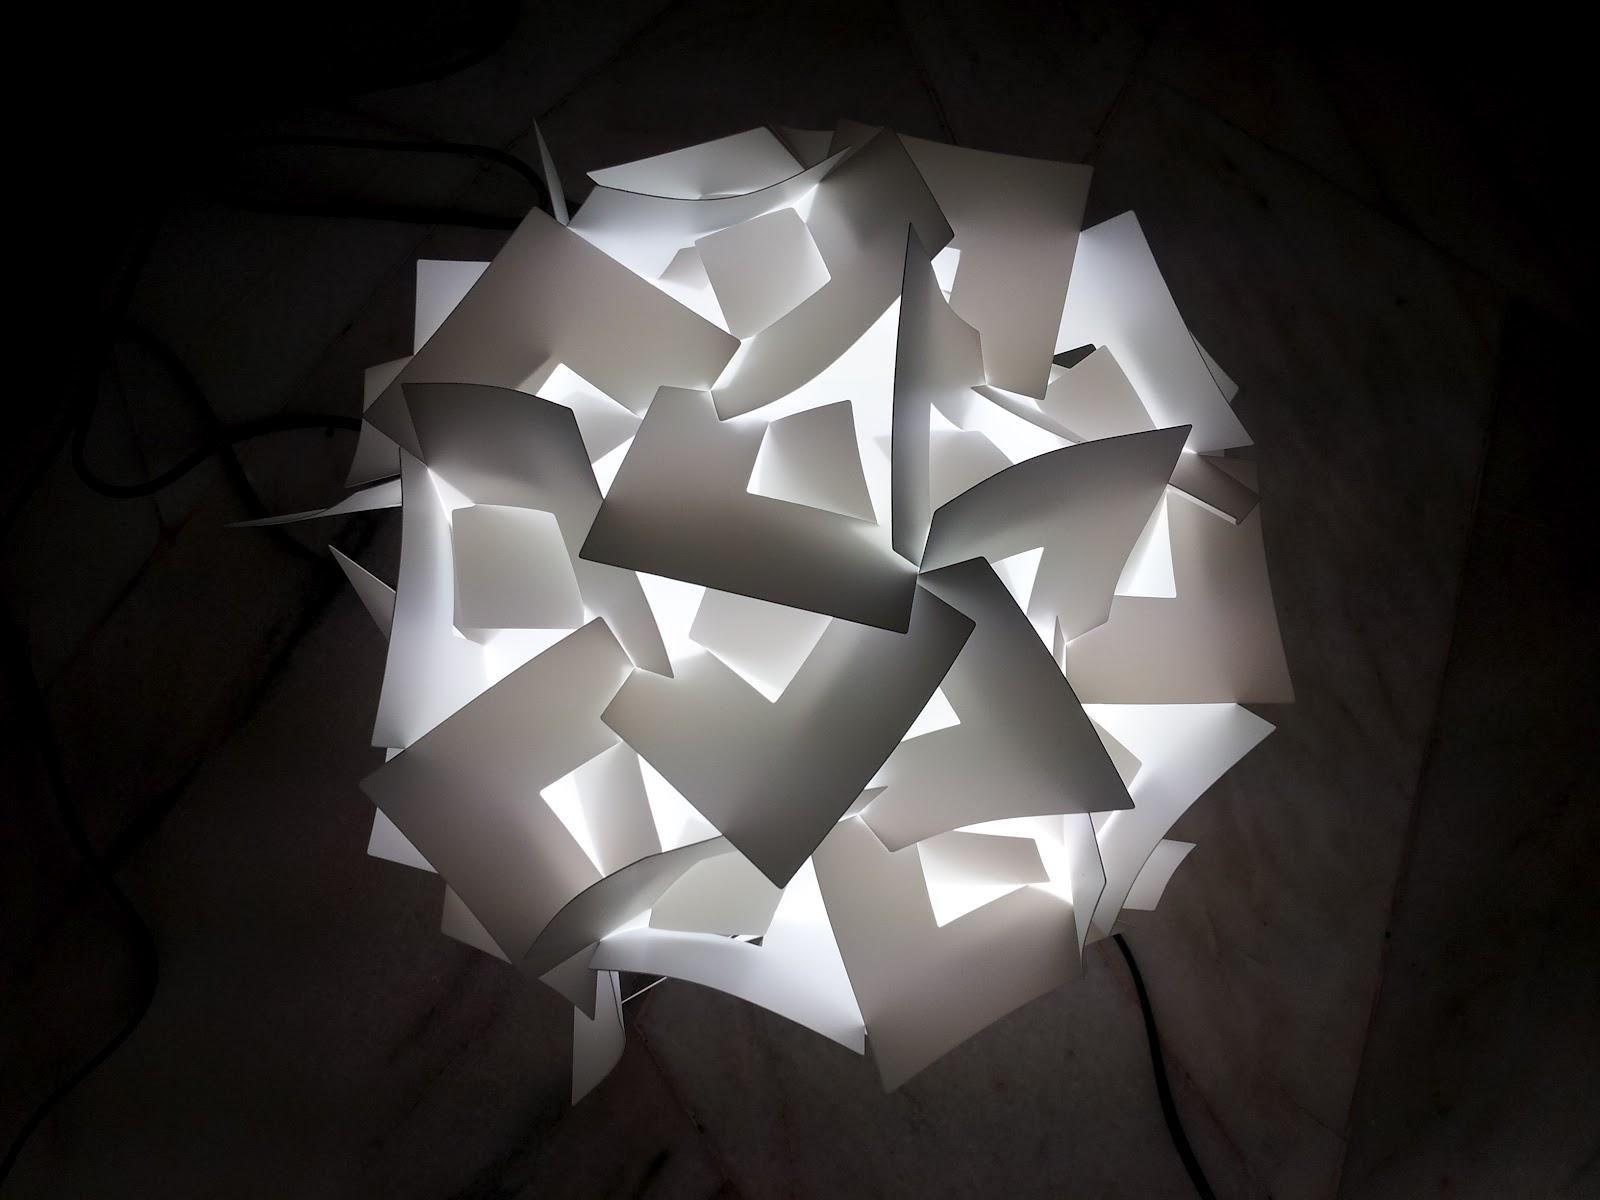 vlightdeco iq light puzzle pendant jigsaw lamp styles 09 09 12. Black Bedroom Furniture Sets. Home Design Ideas